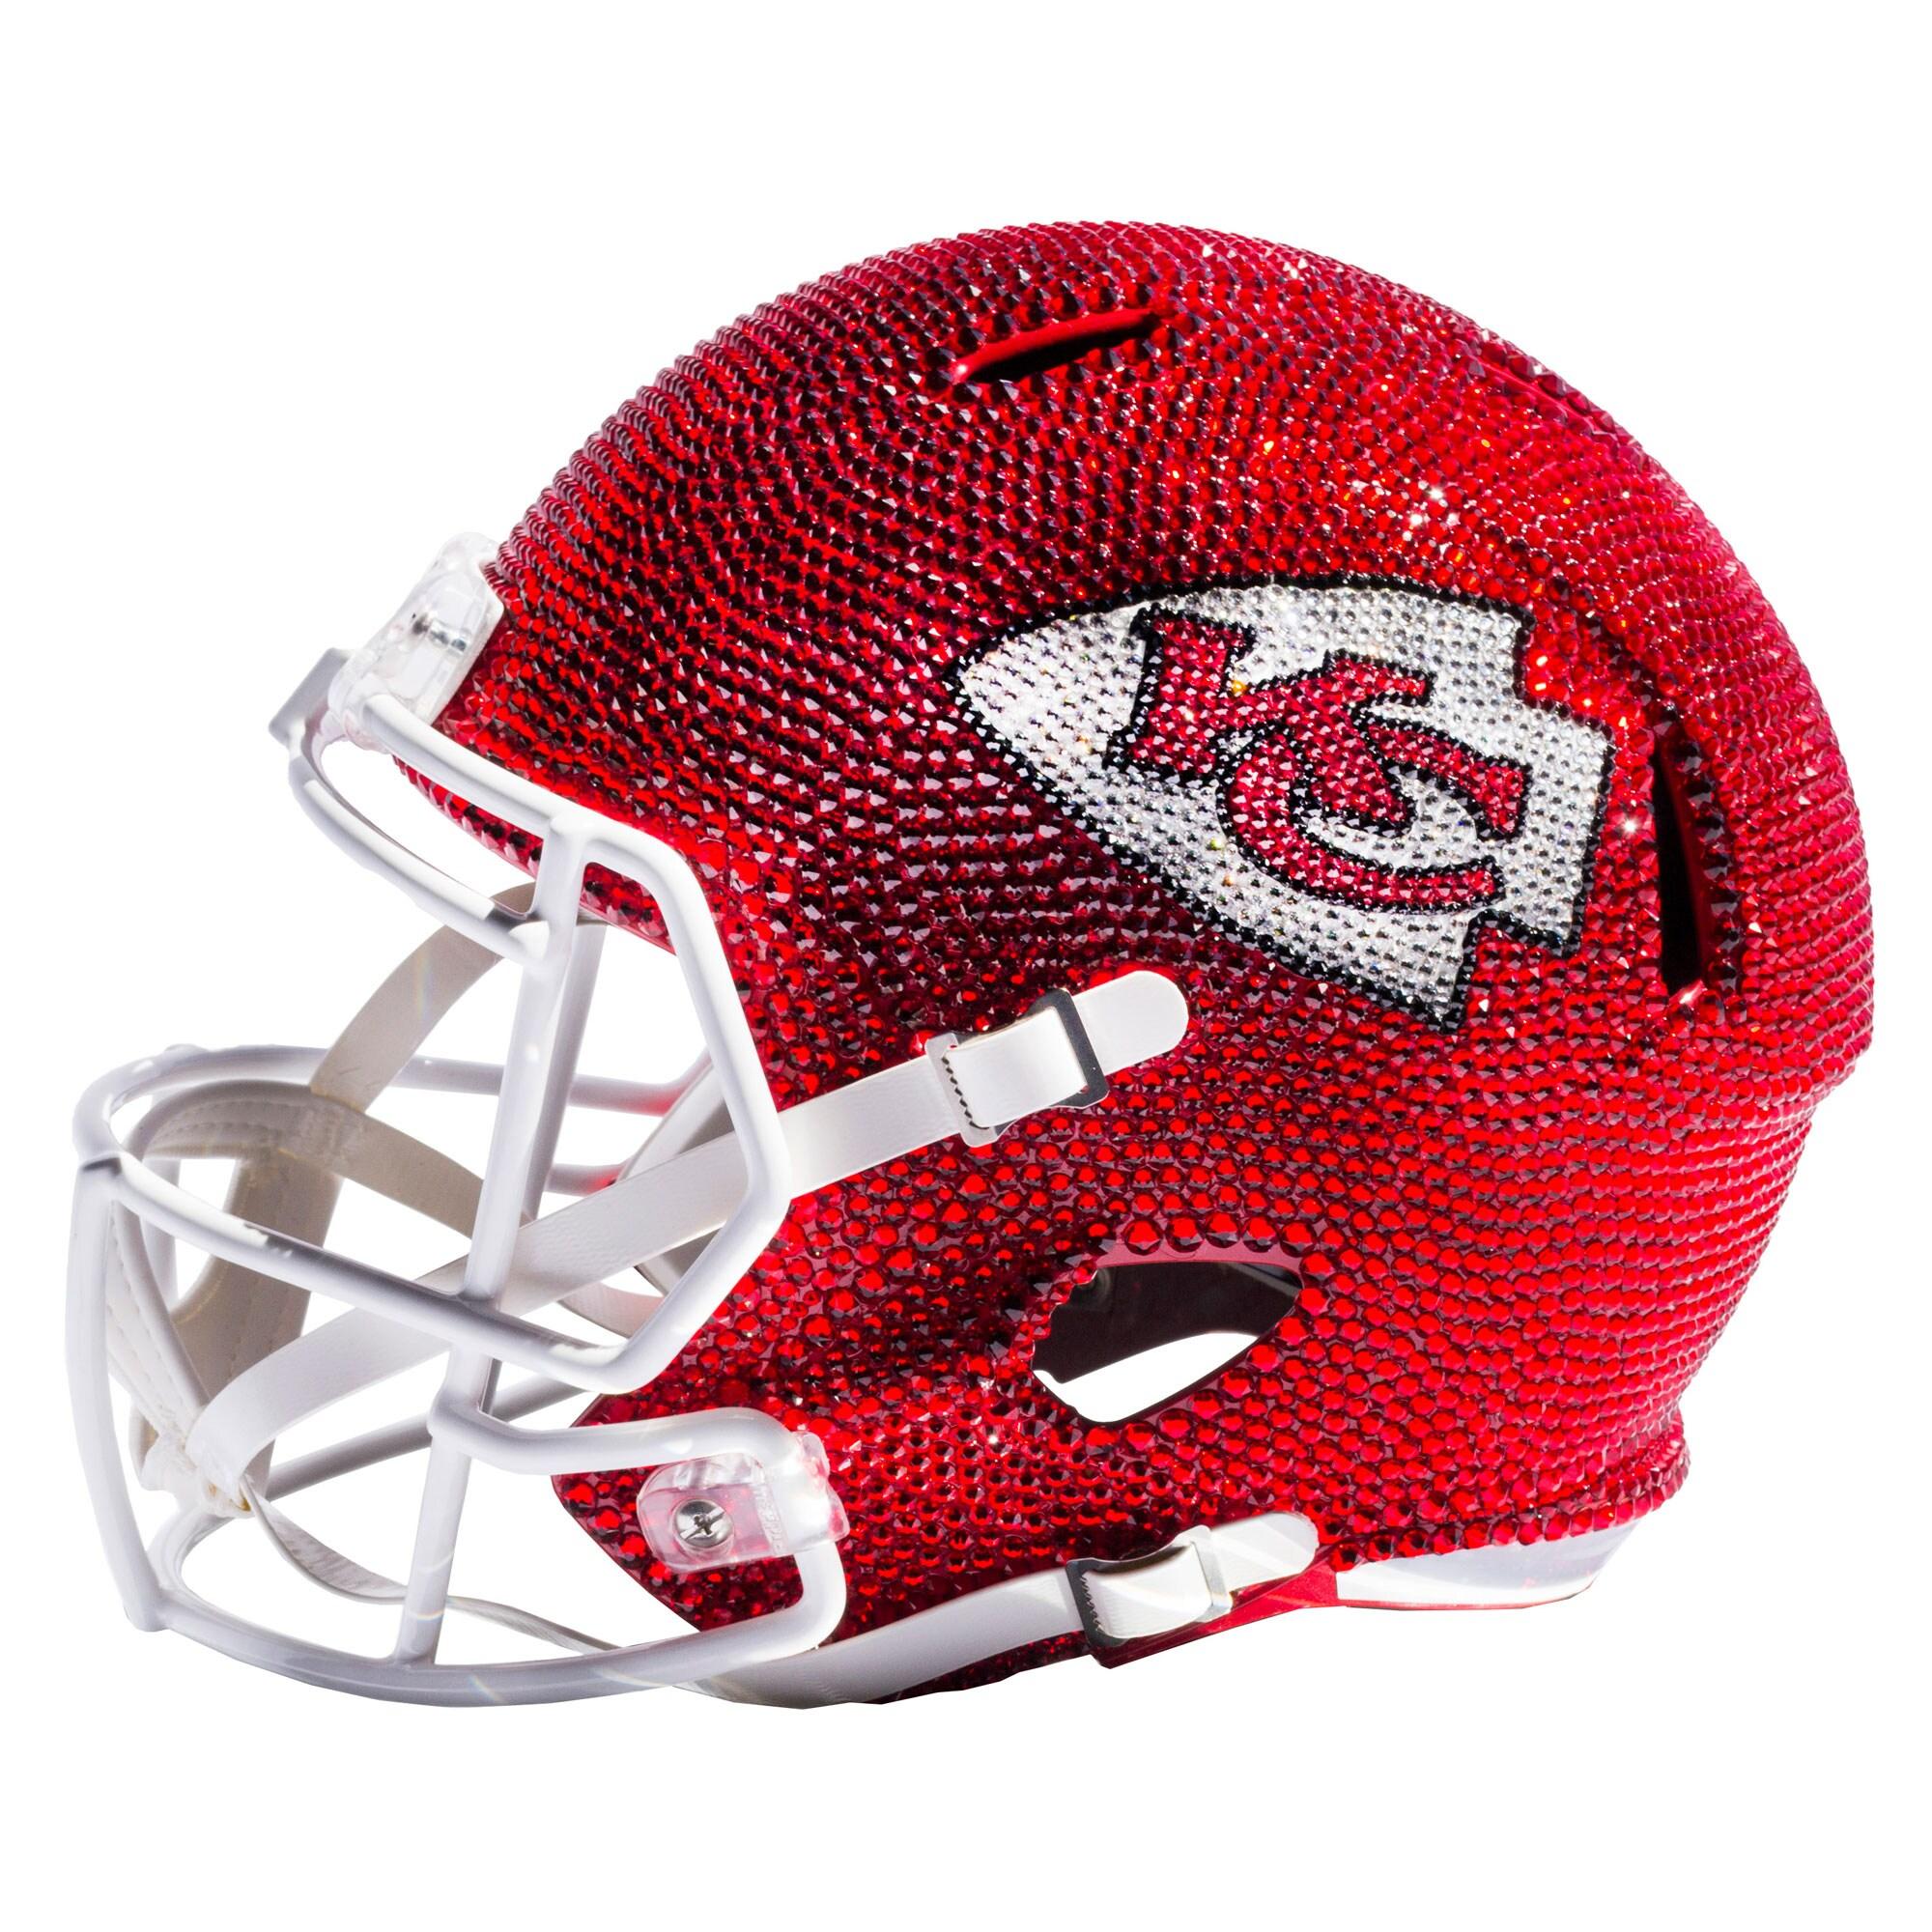 Kansas City Chiefs Swarovski Crystal Large Football Helmet